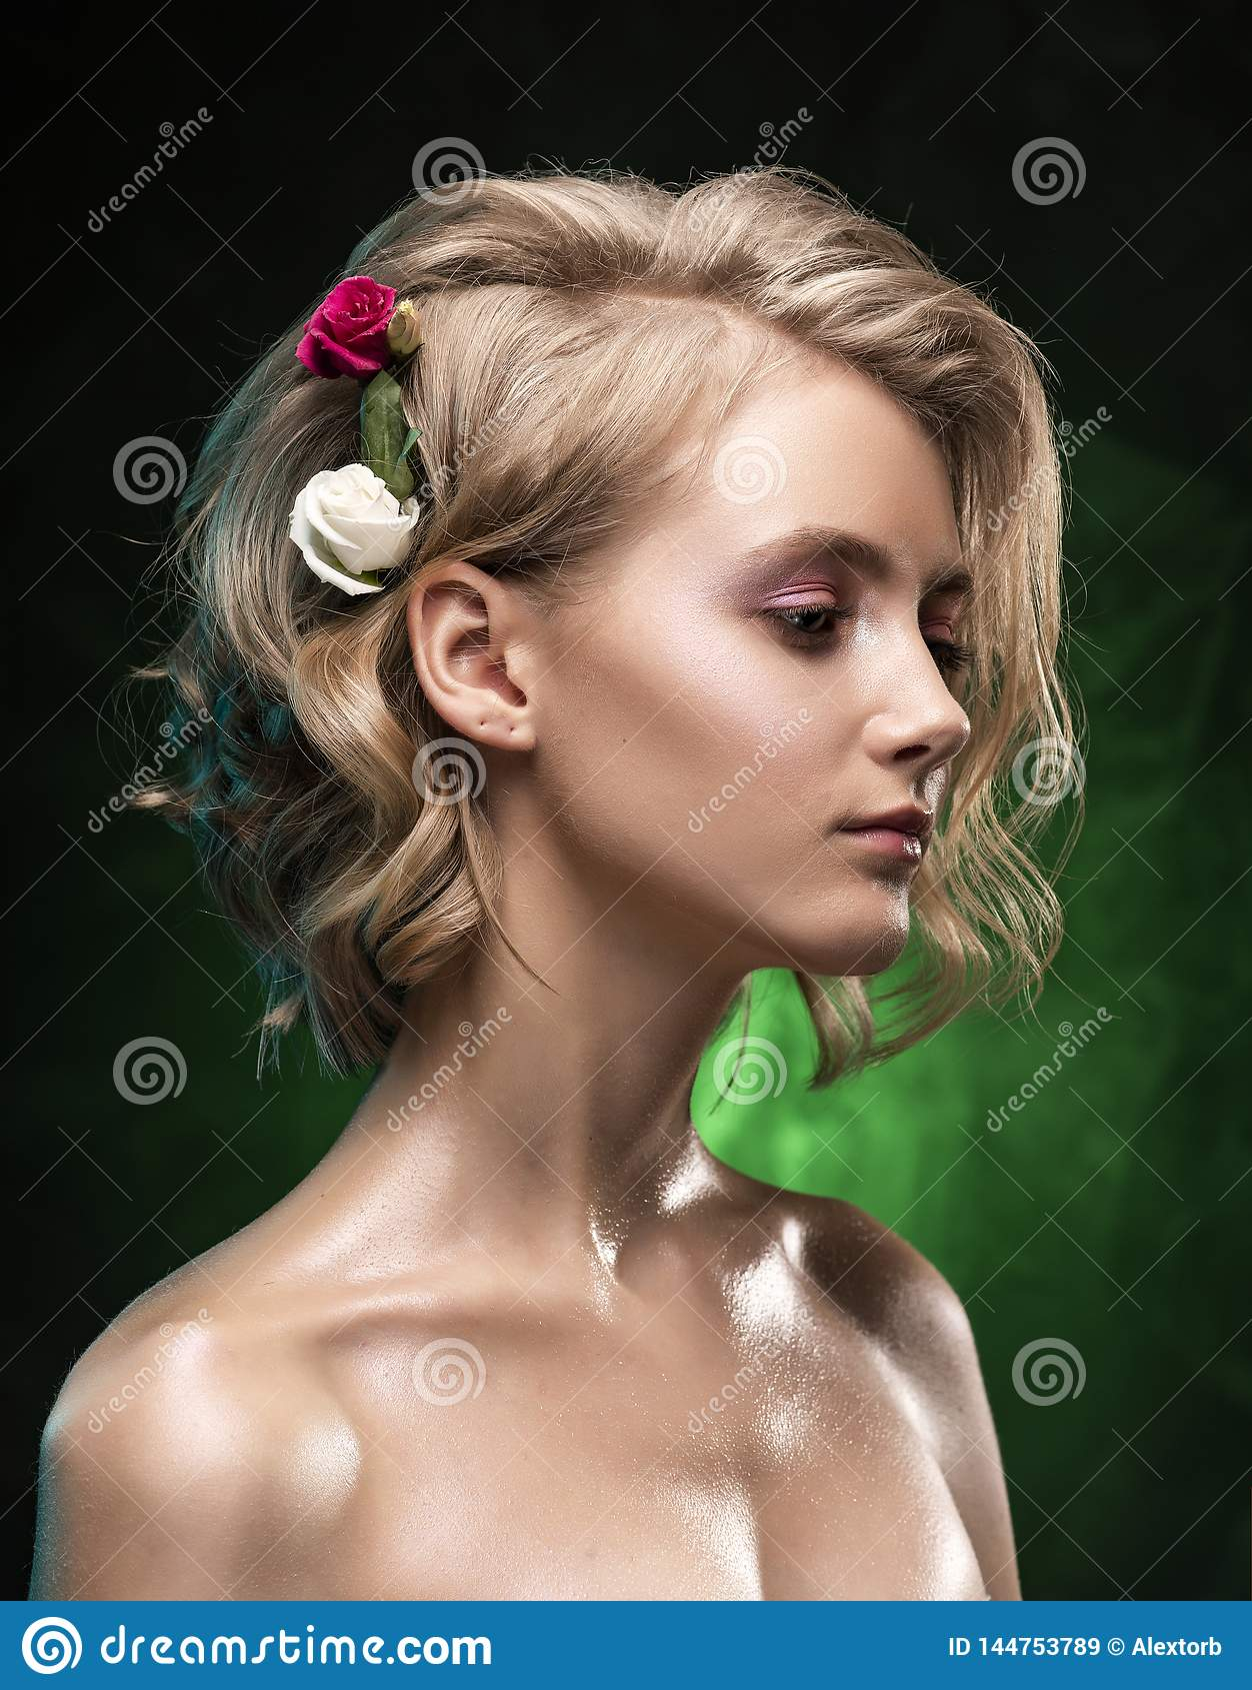 Nude girls with braids